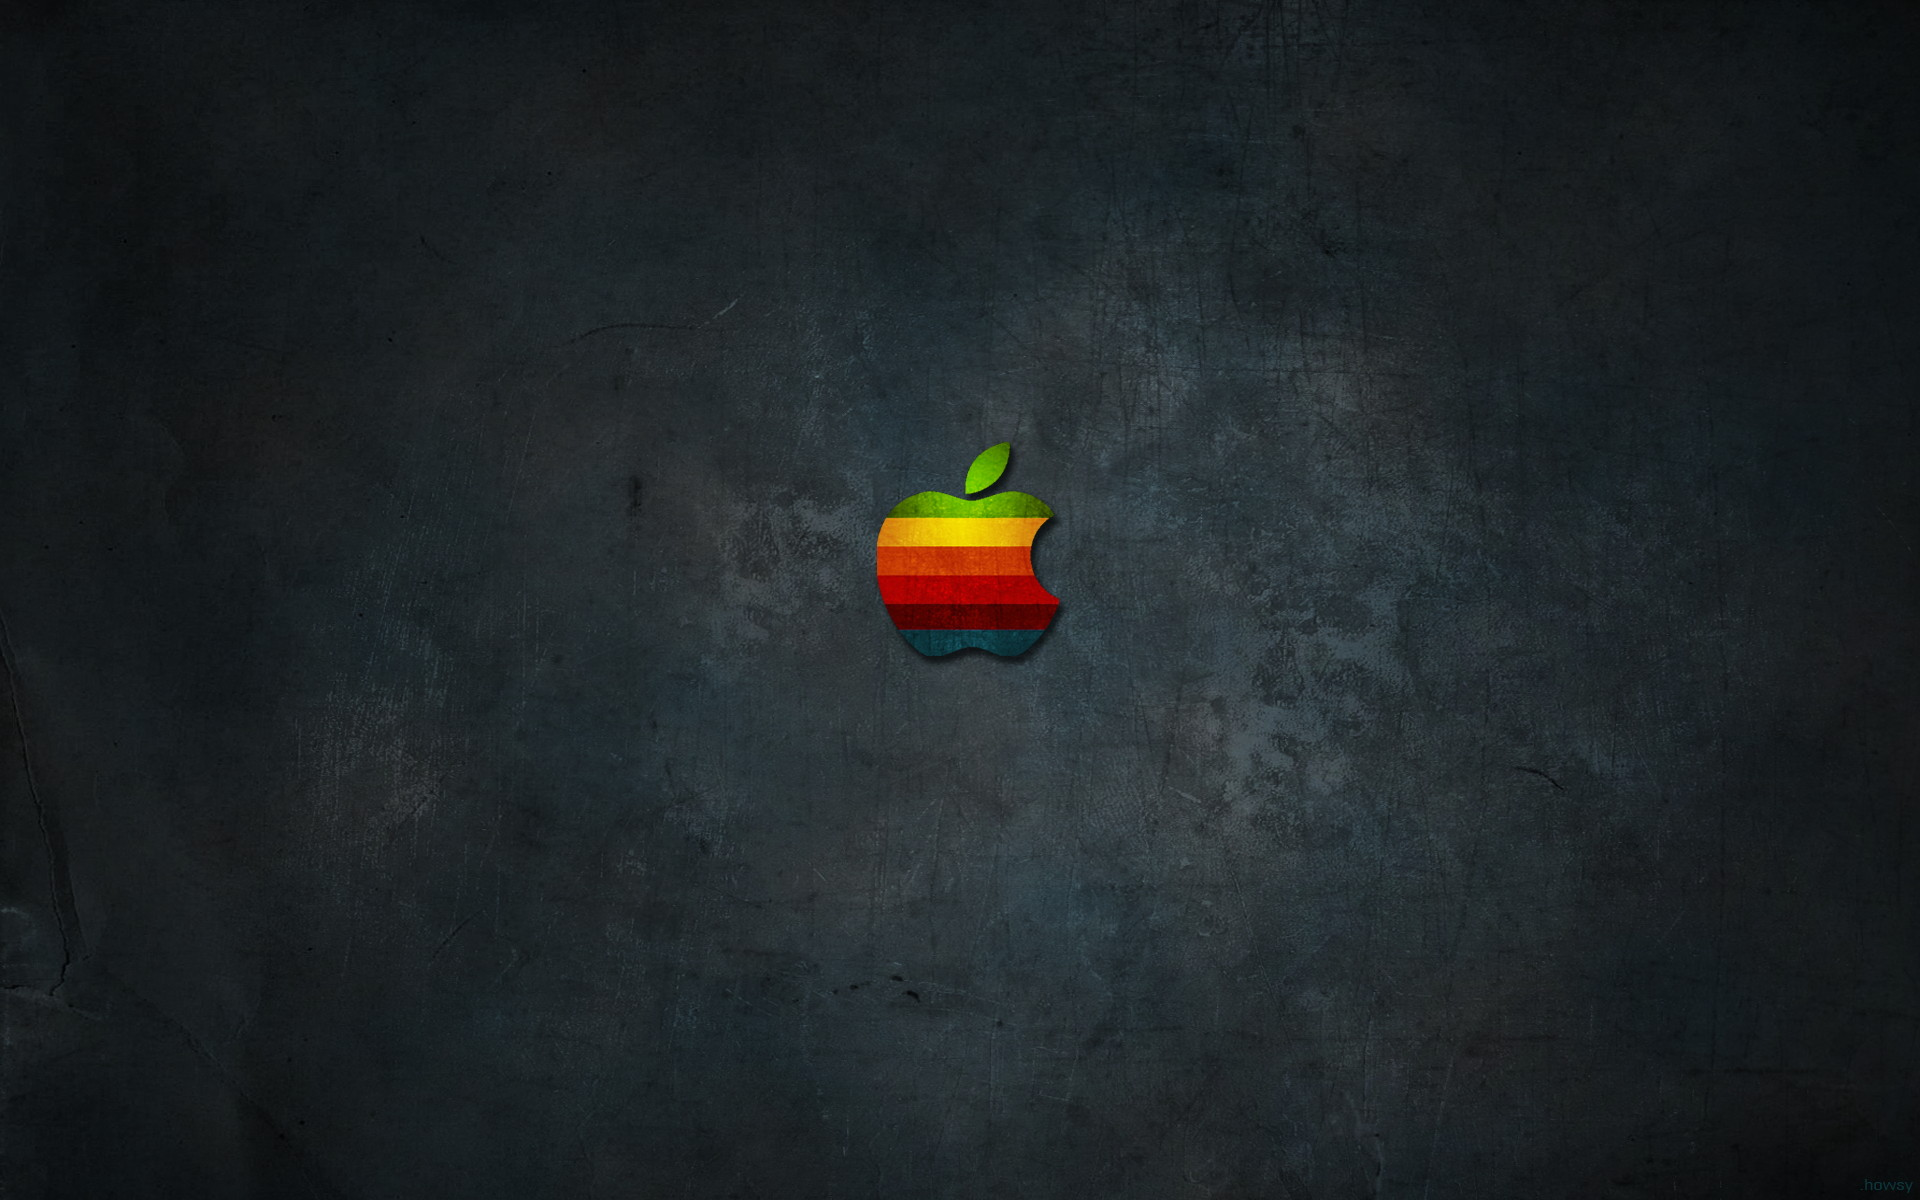 Top Apple Wallpaper Hd